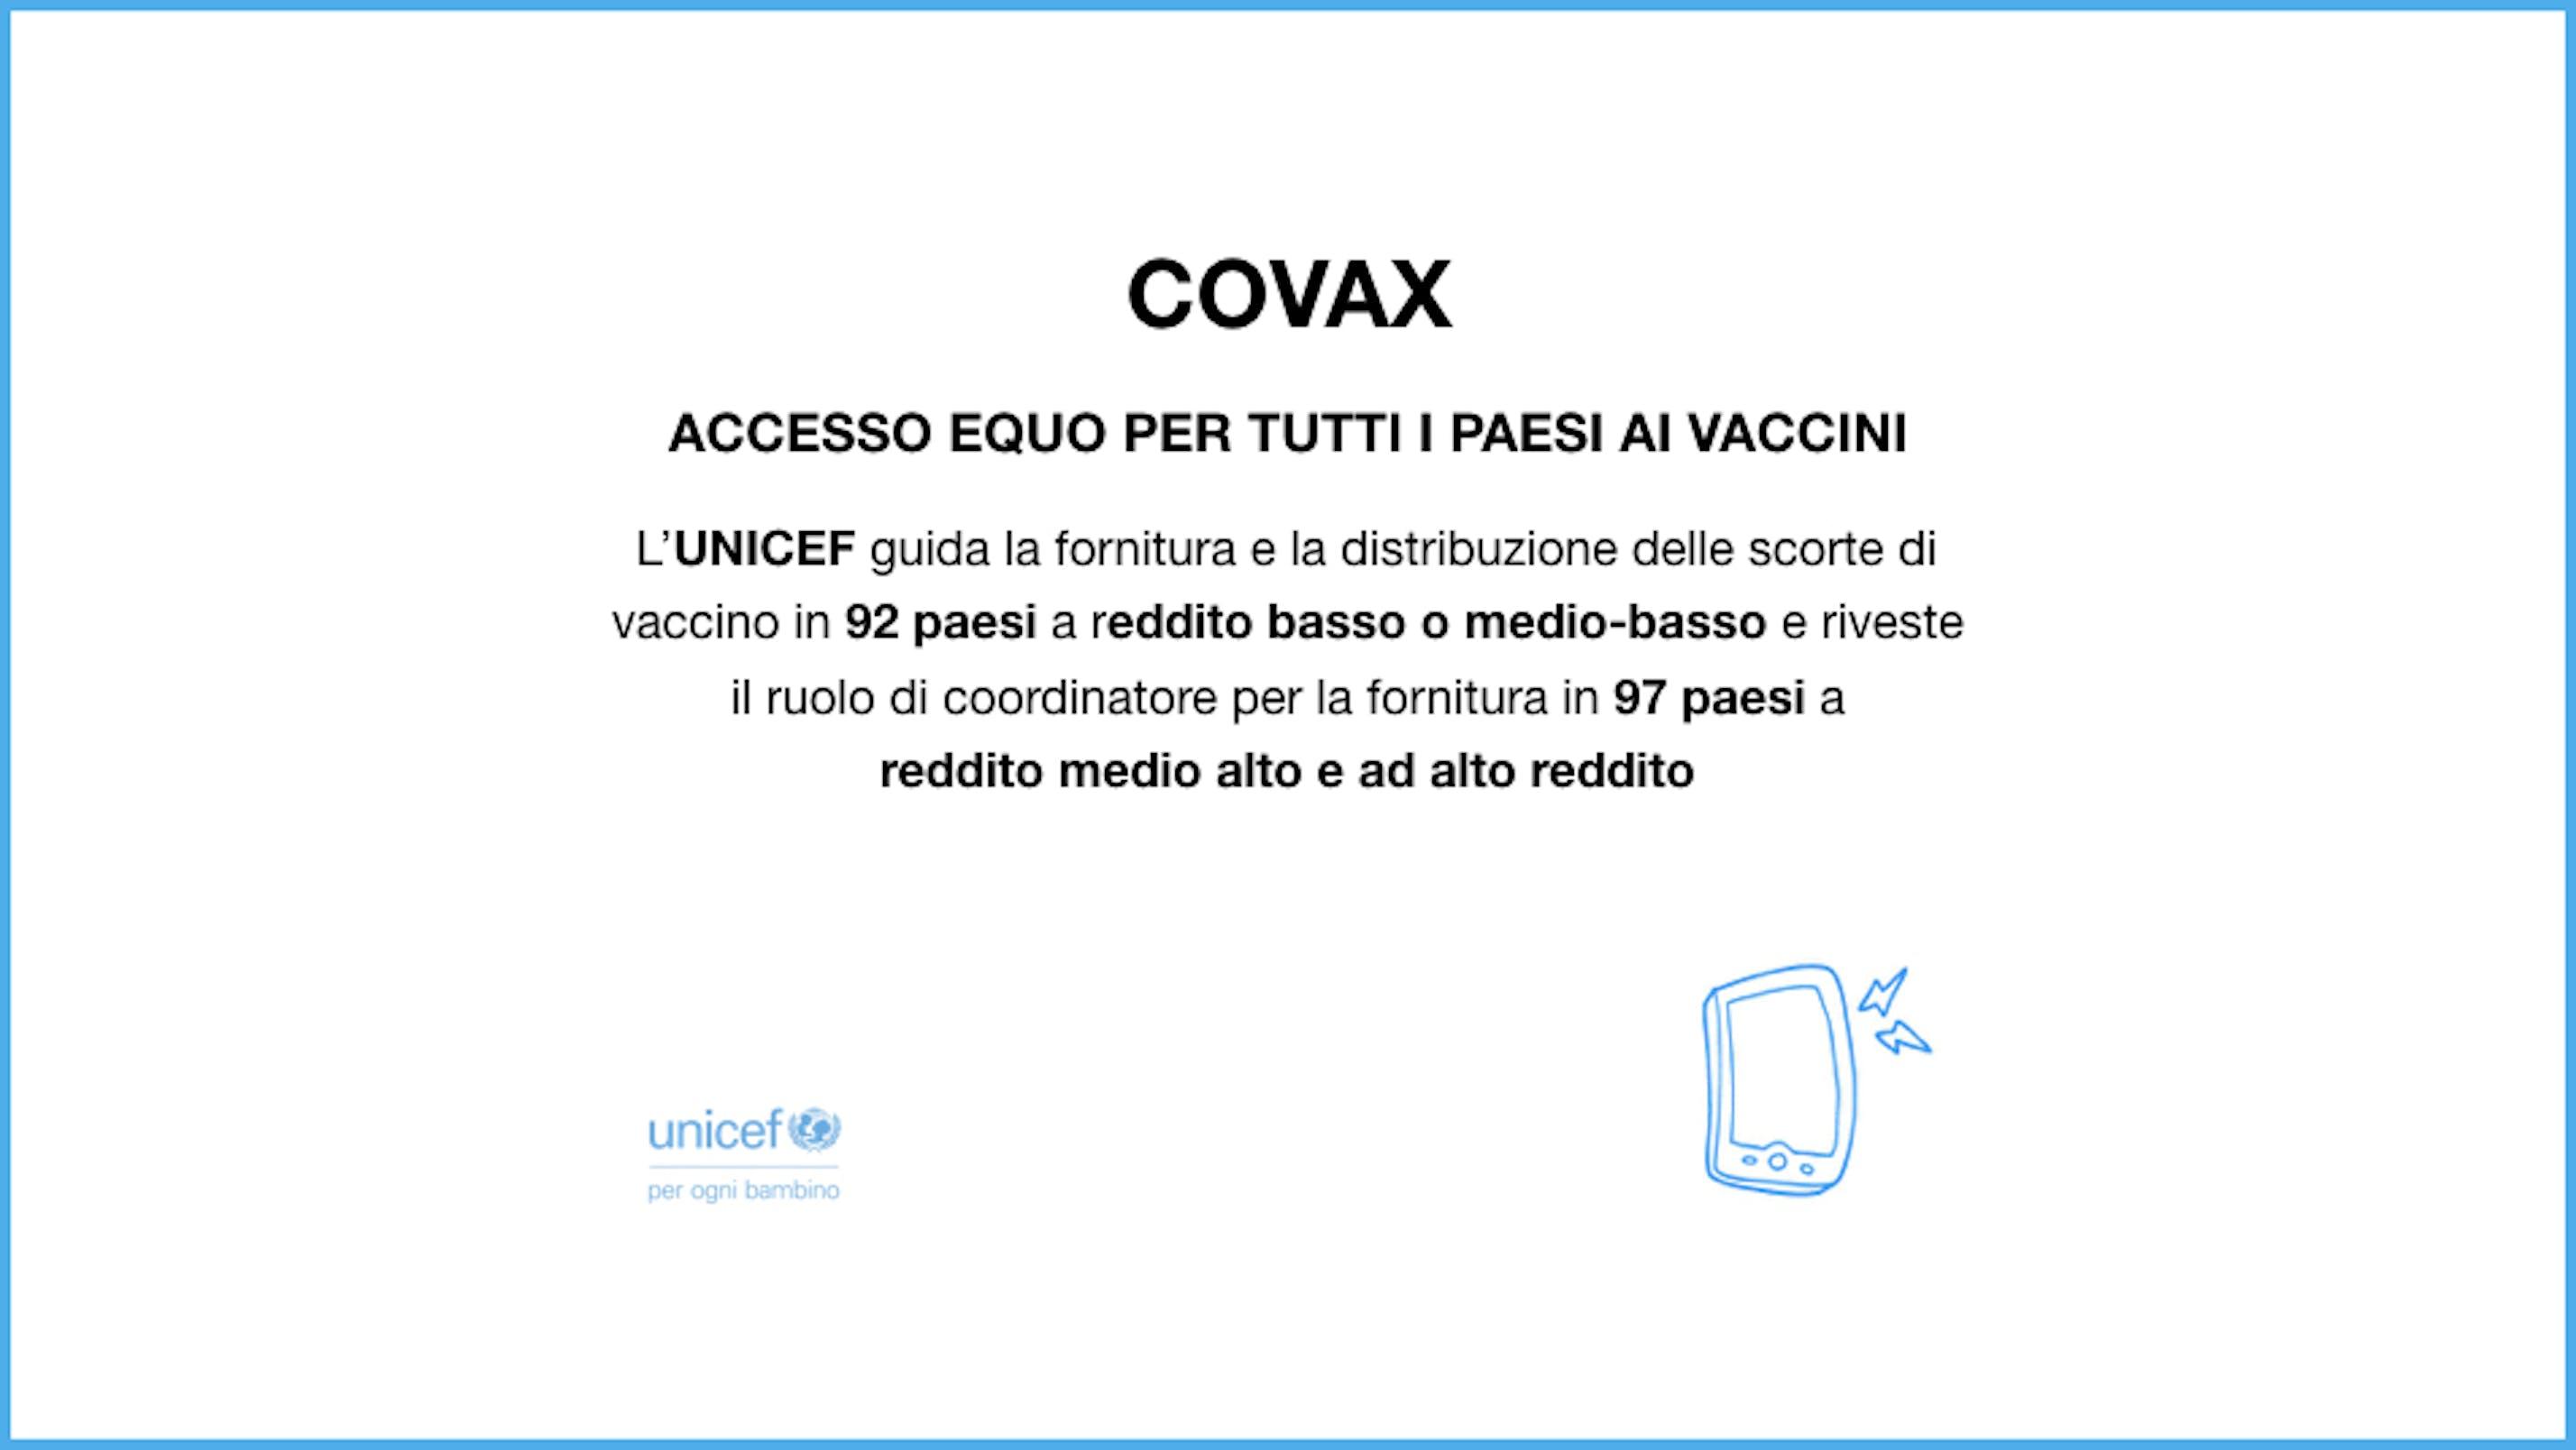 Covax 7